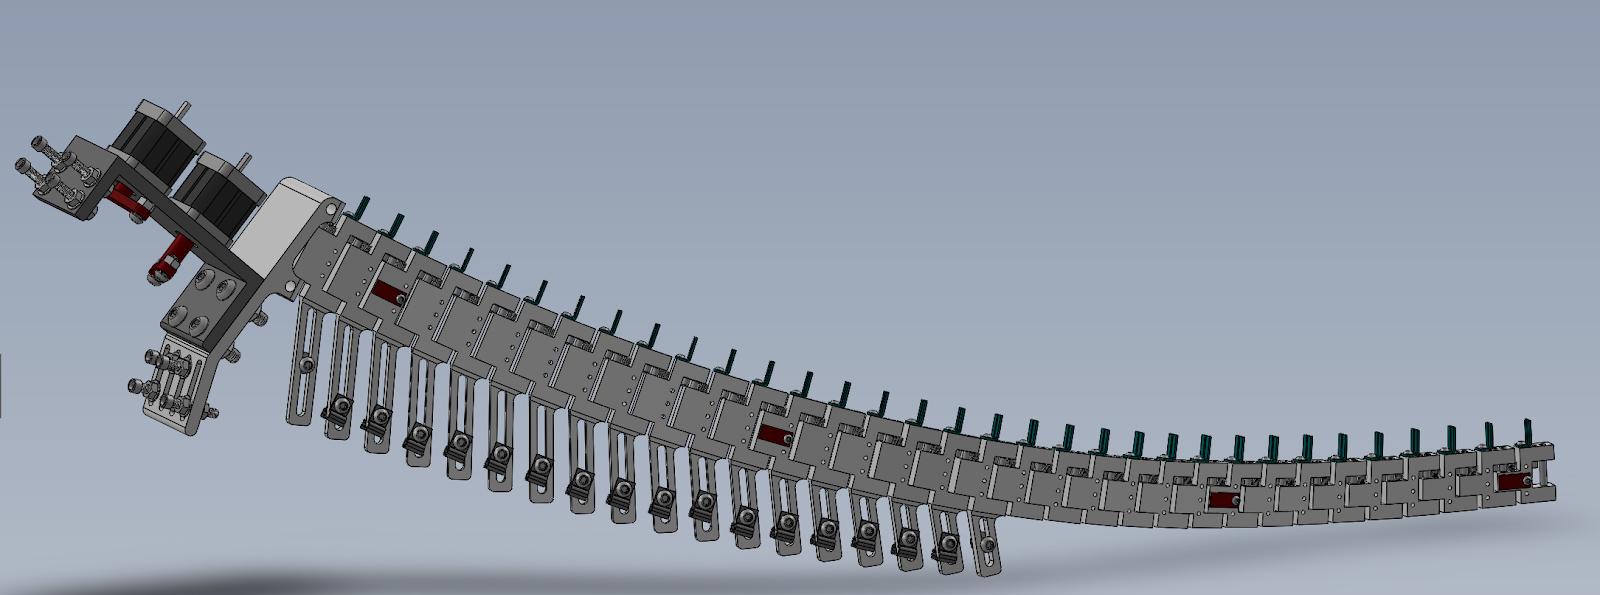 computer model of mechanical dinosaur tail.